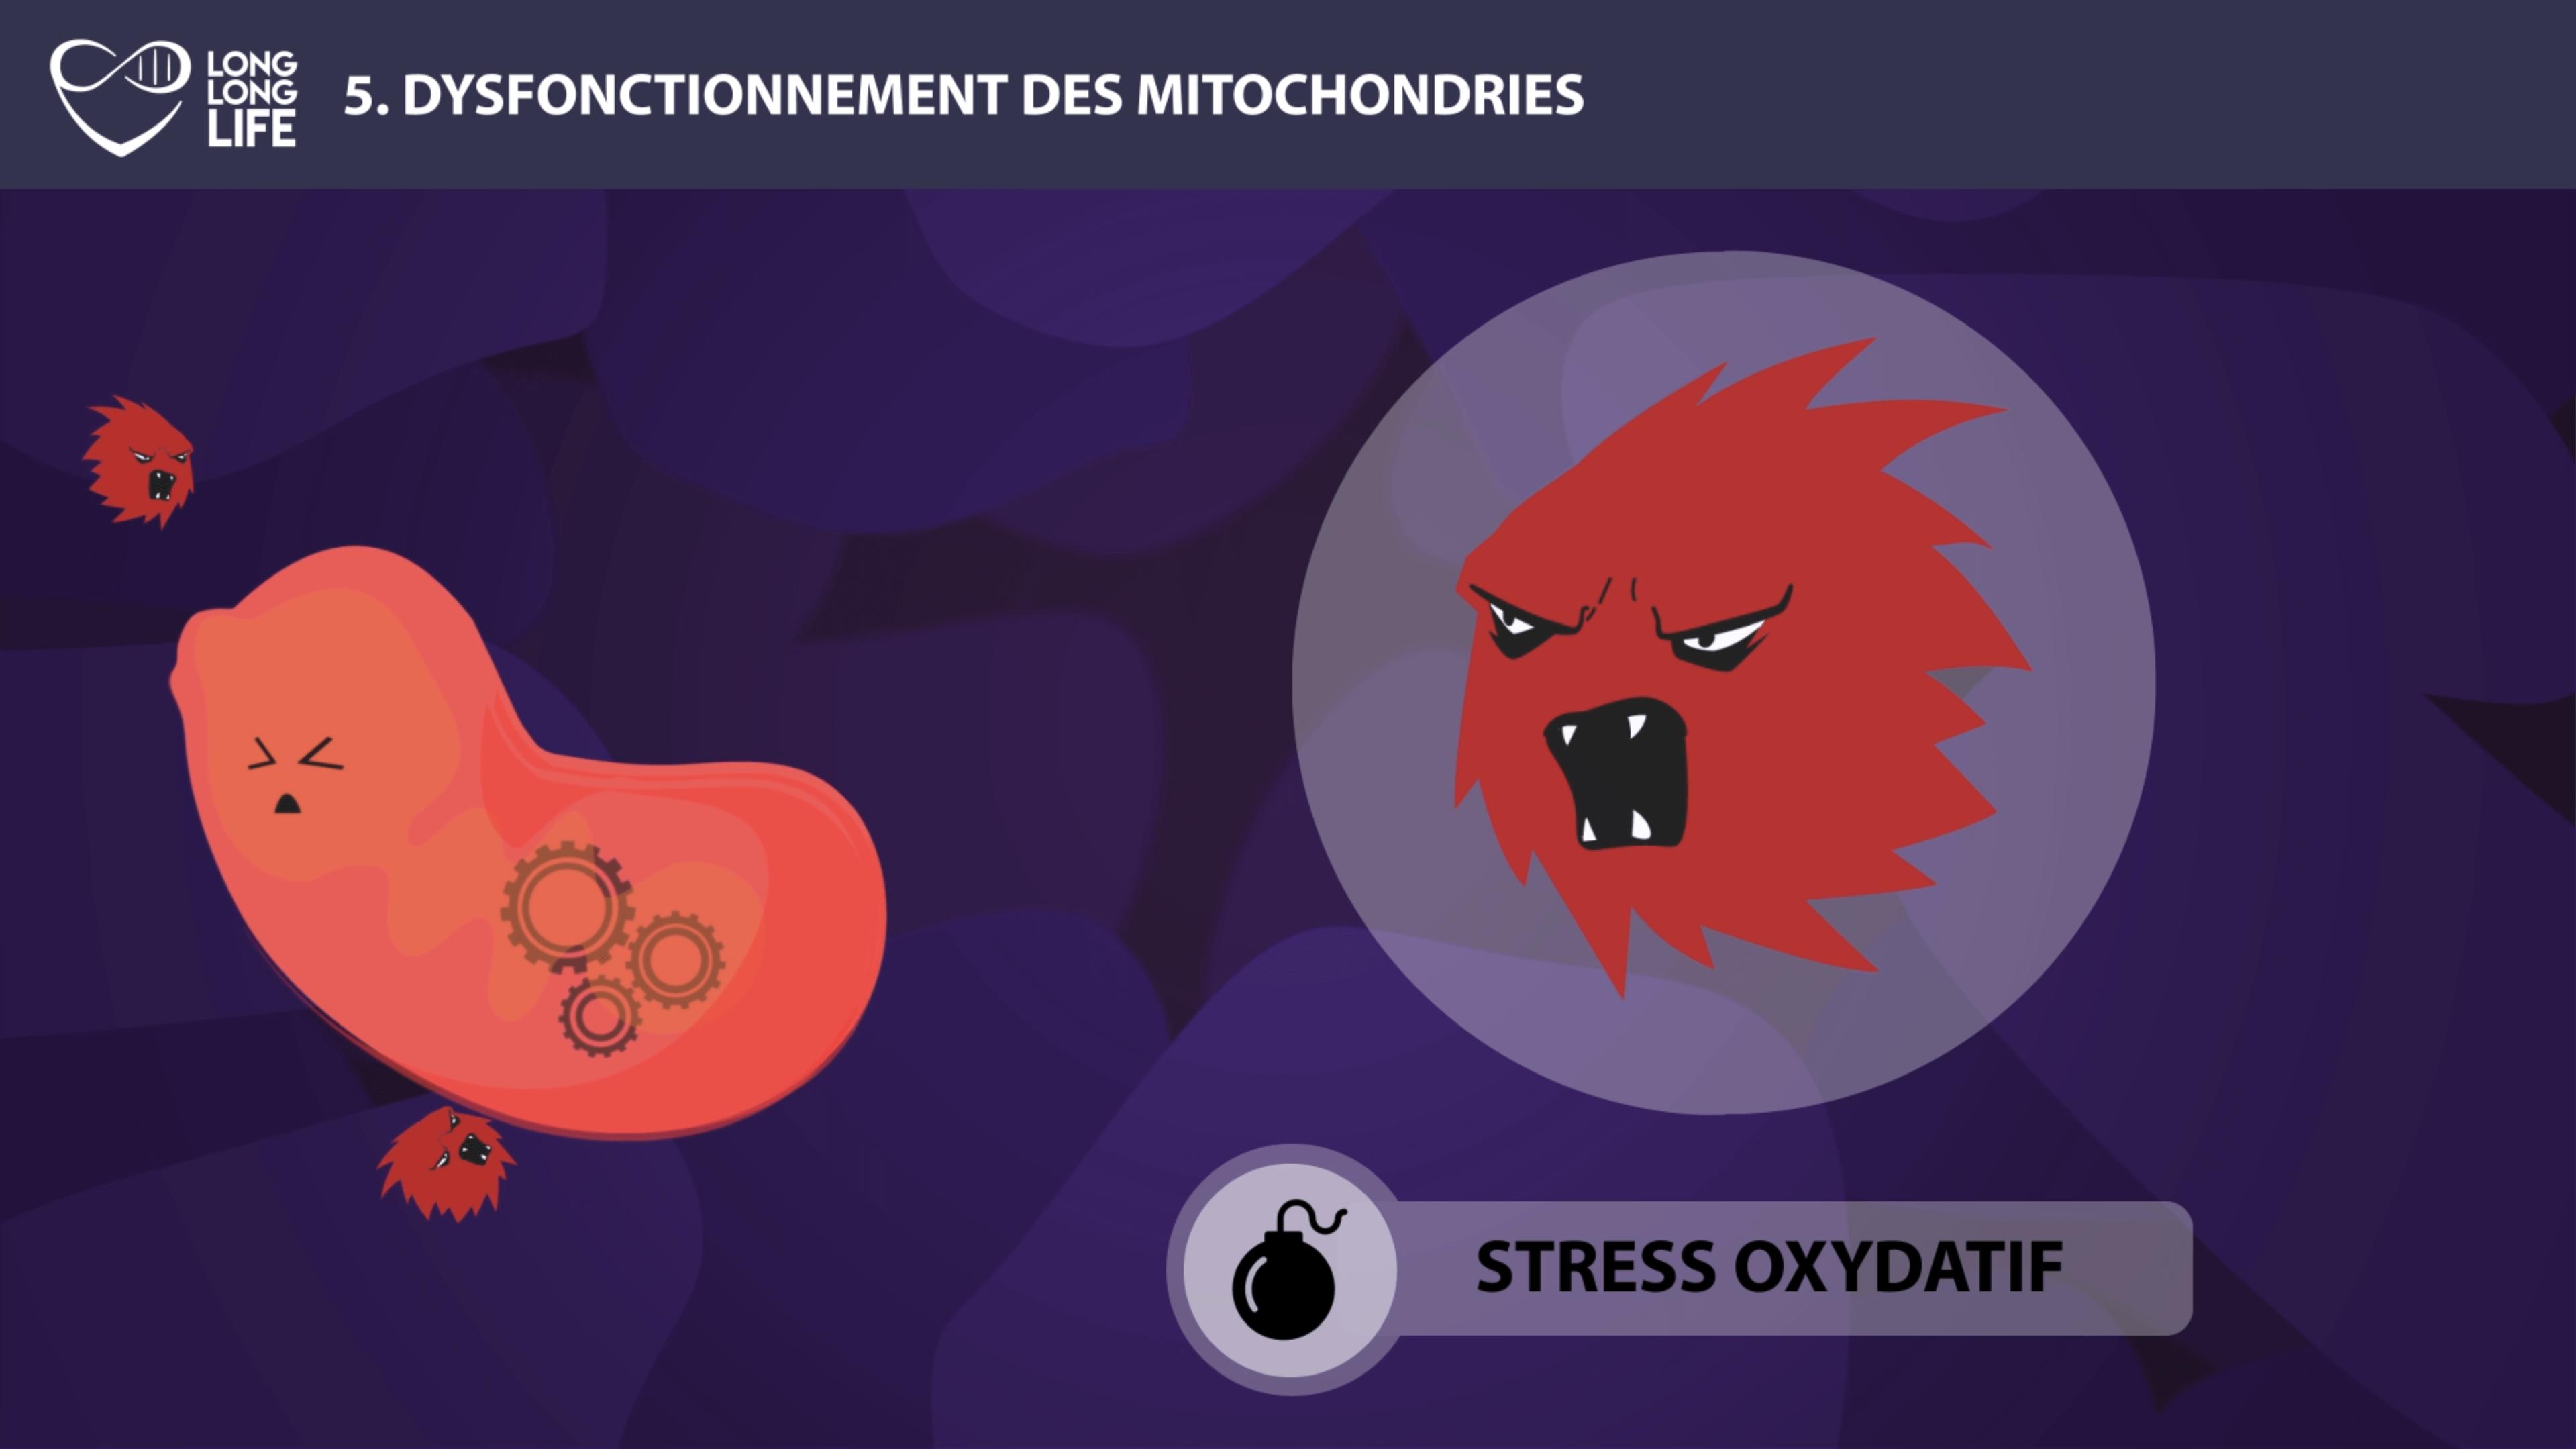 mitochondries long long life longévité transhumanisme vieillissement stress oxydatif